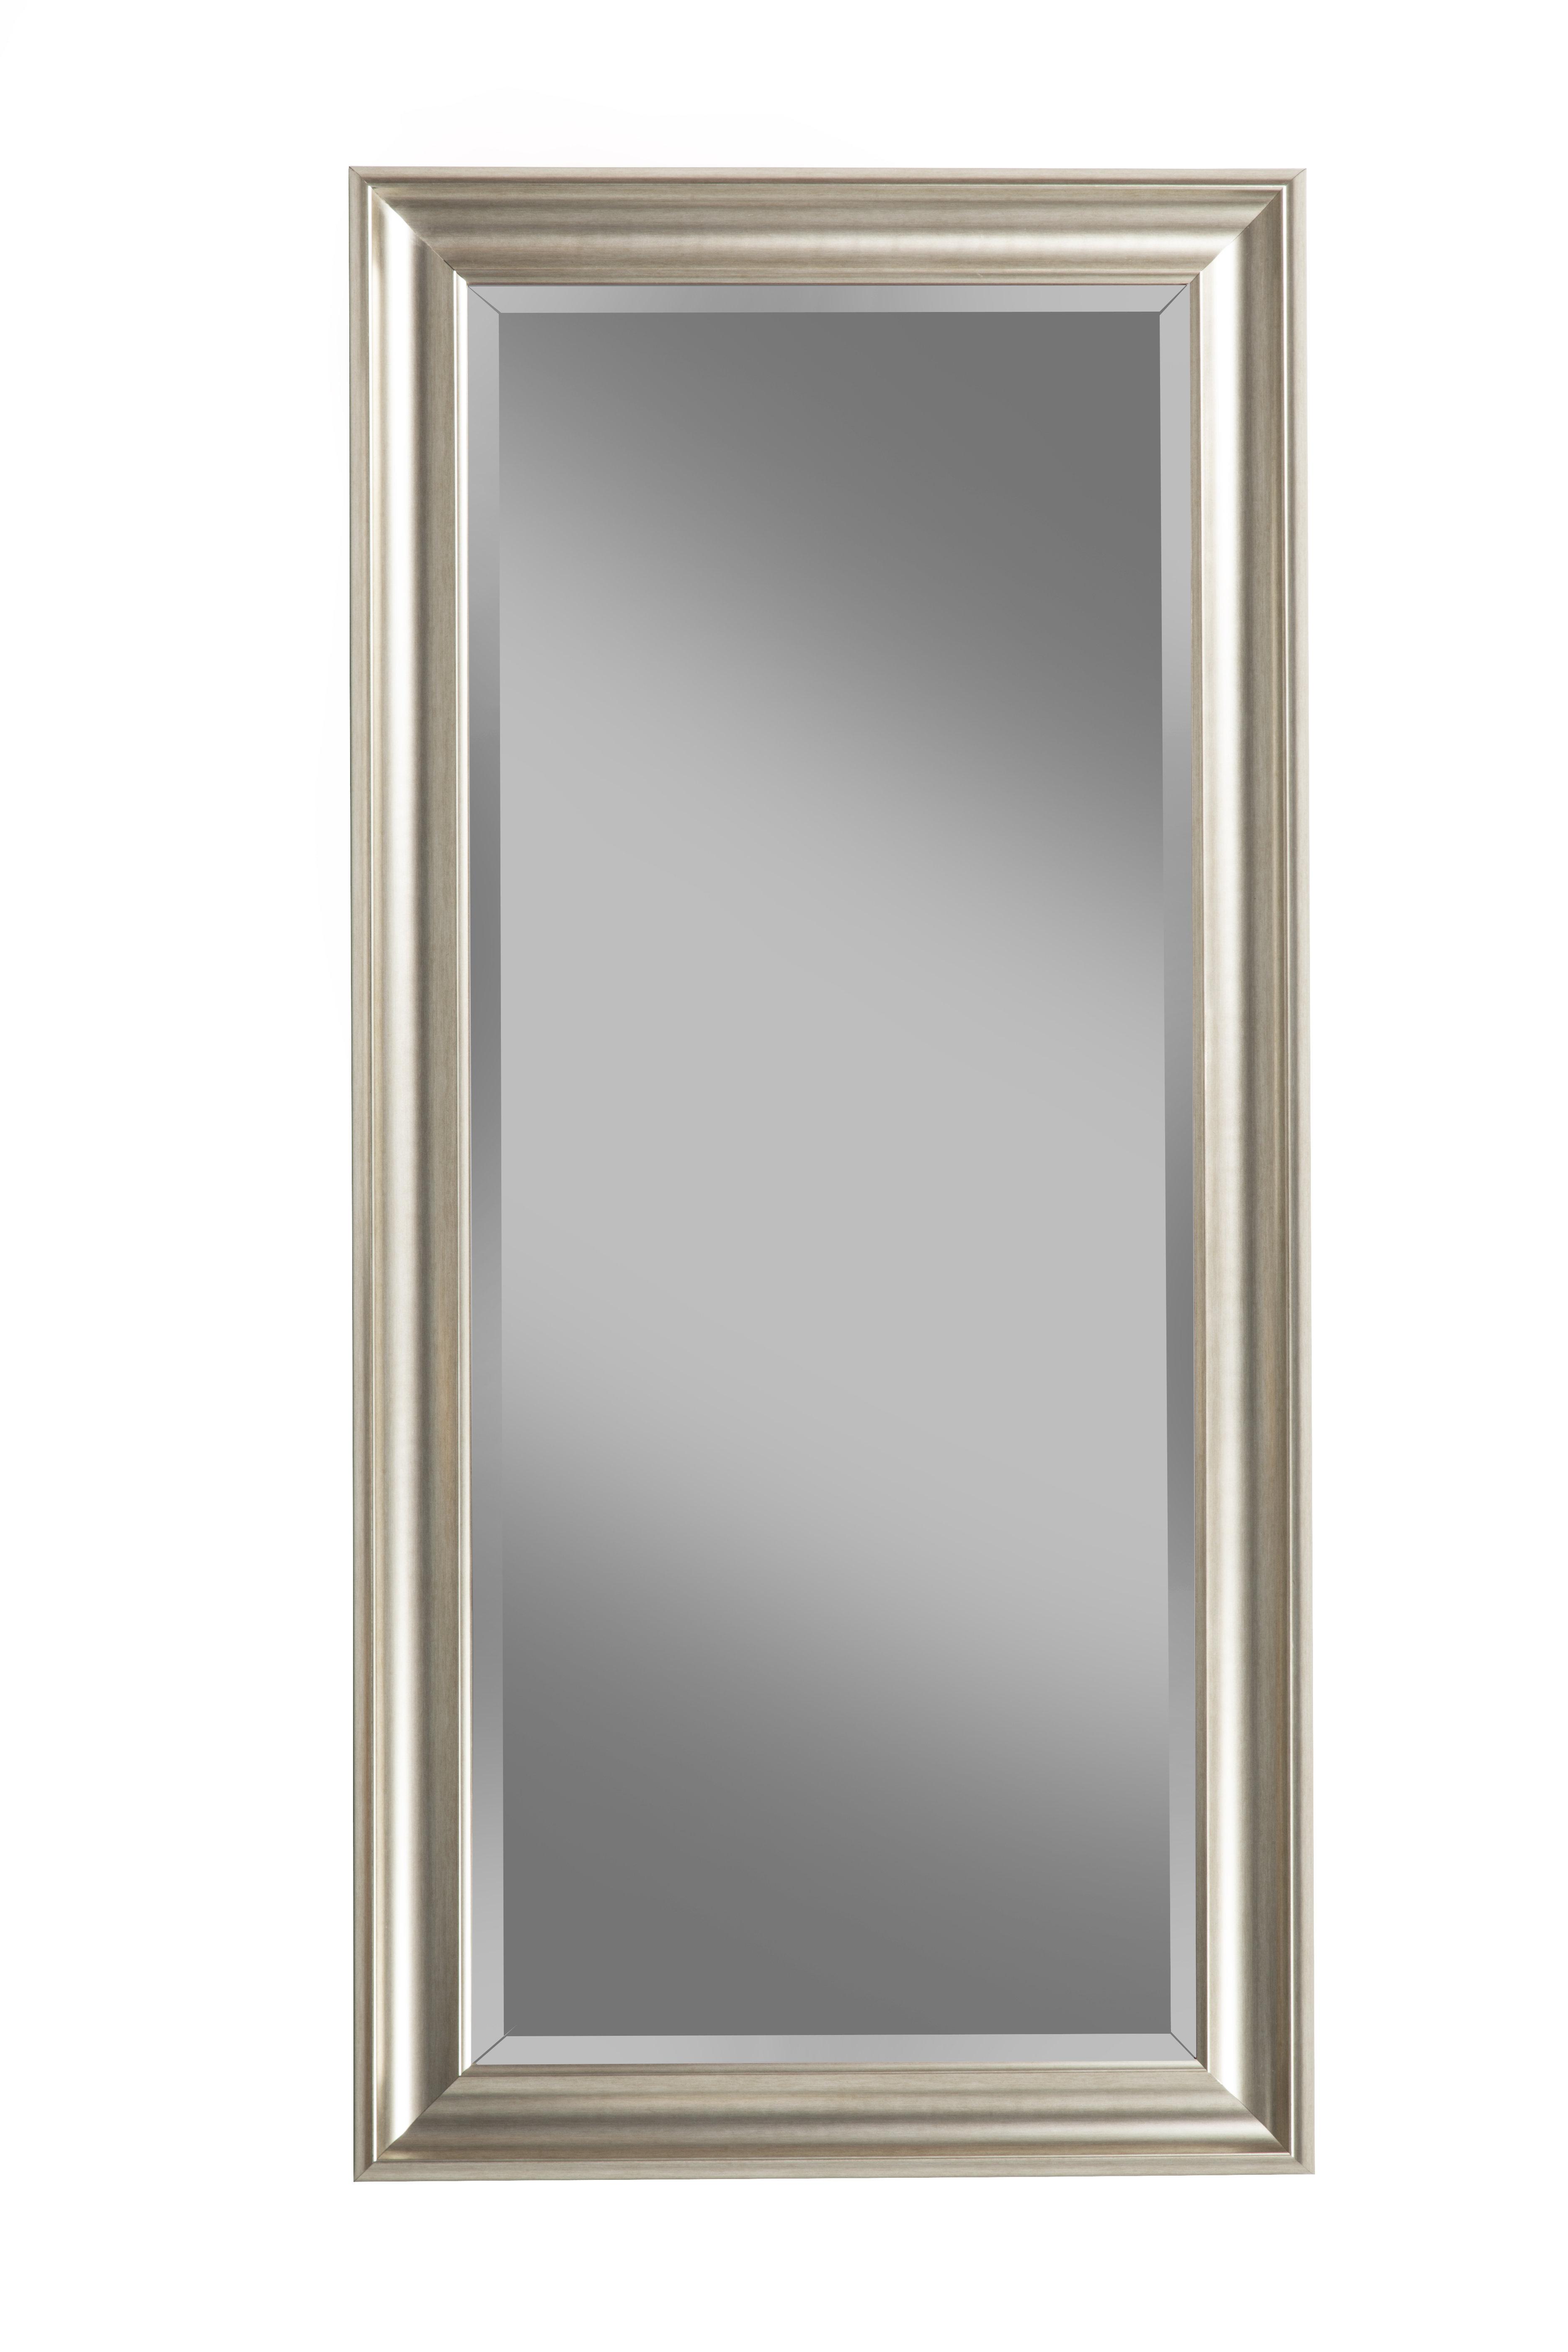 Willa Arlo Interiors Northcutt Full Length Mirror For Bartolo Accent Mirrors (Image 20 of 20)